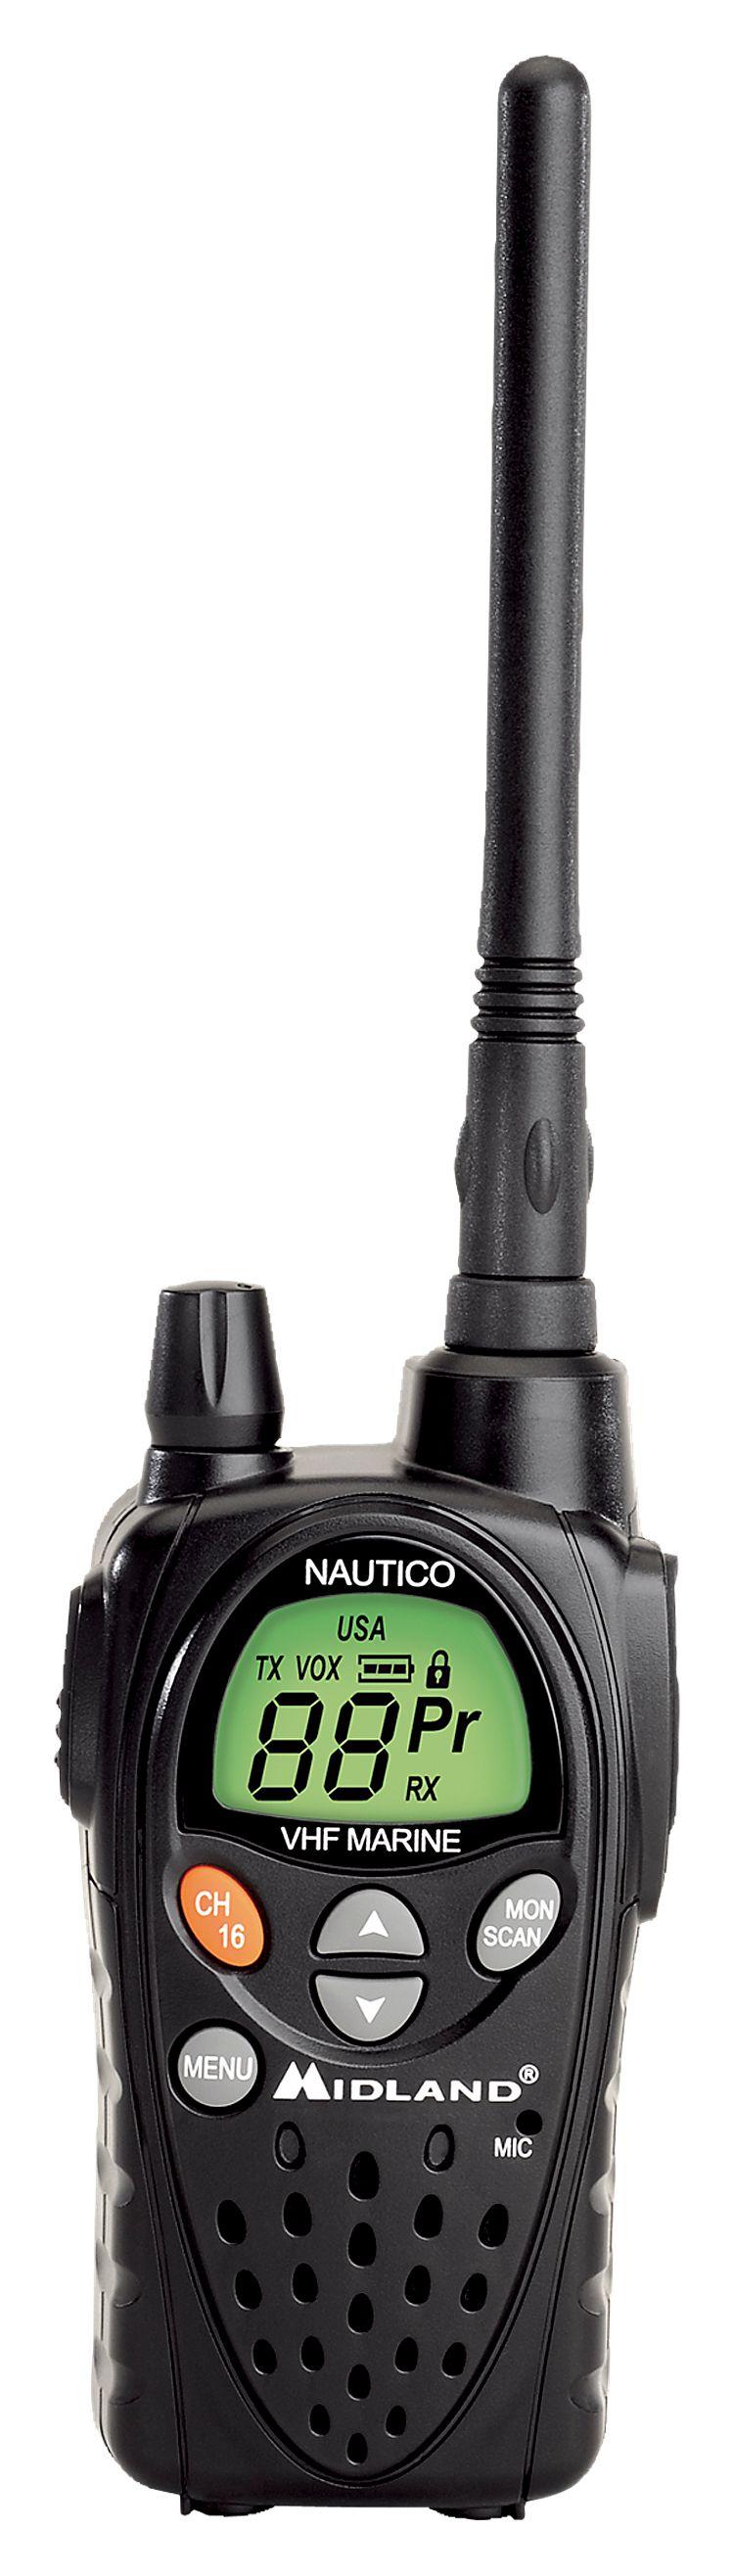 Midland® Nautico® 3 VHF Marine Radio Bass Pro Shops